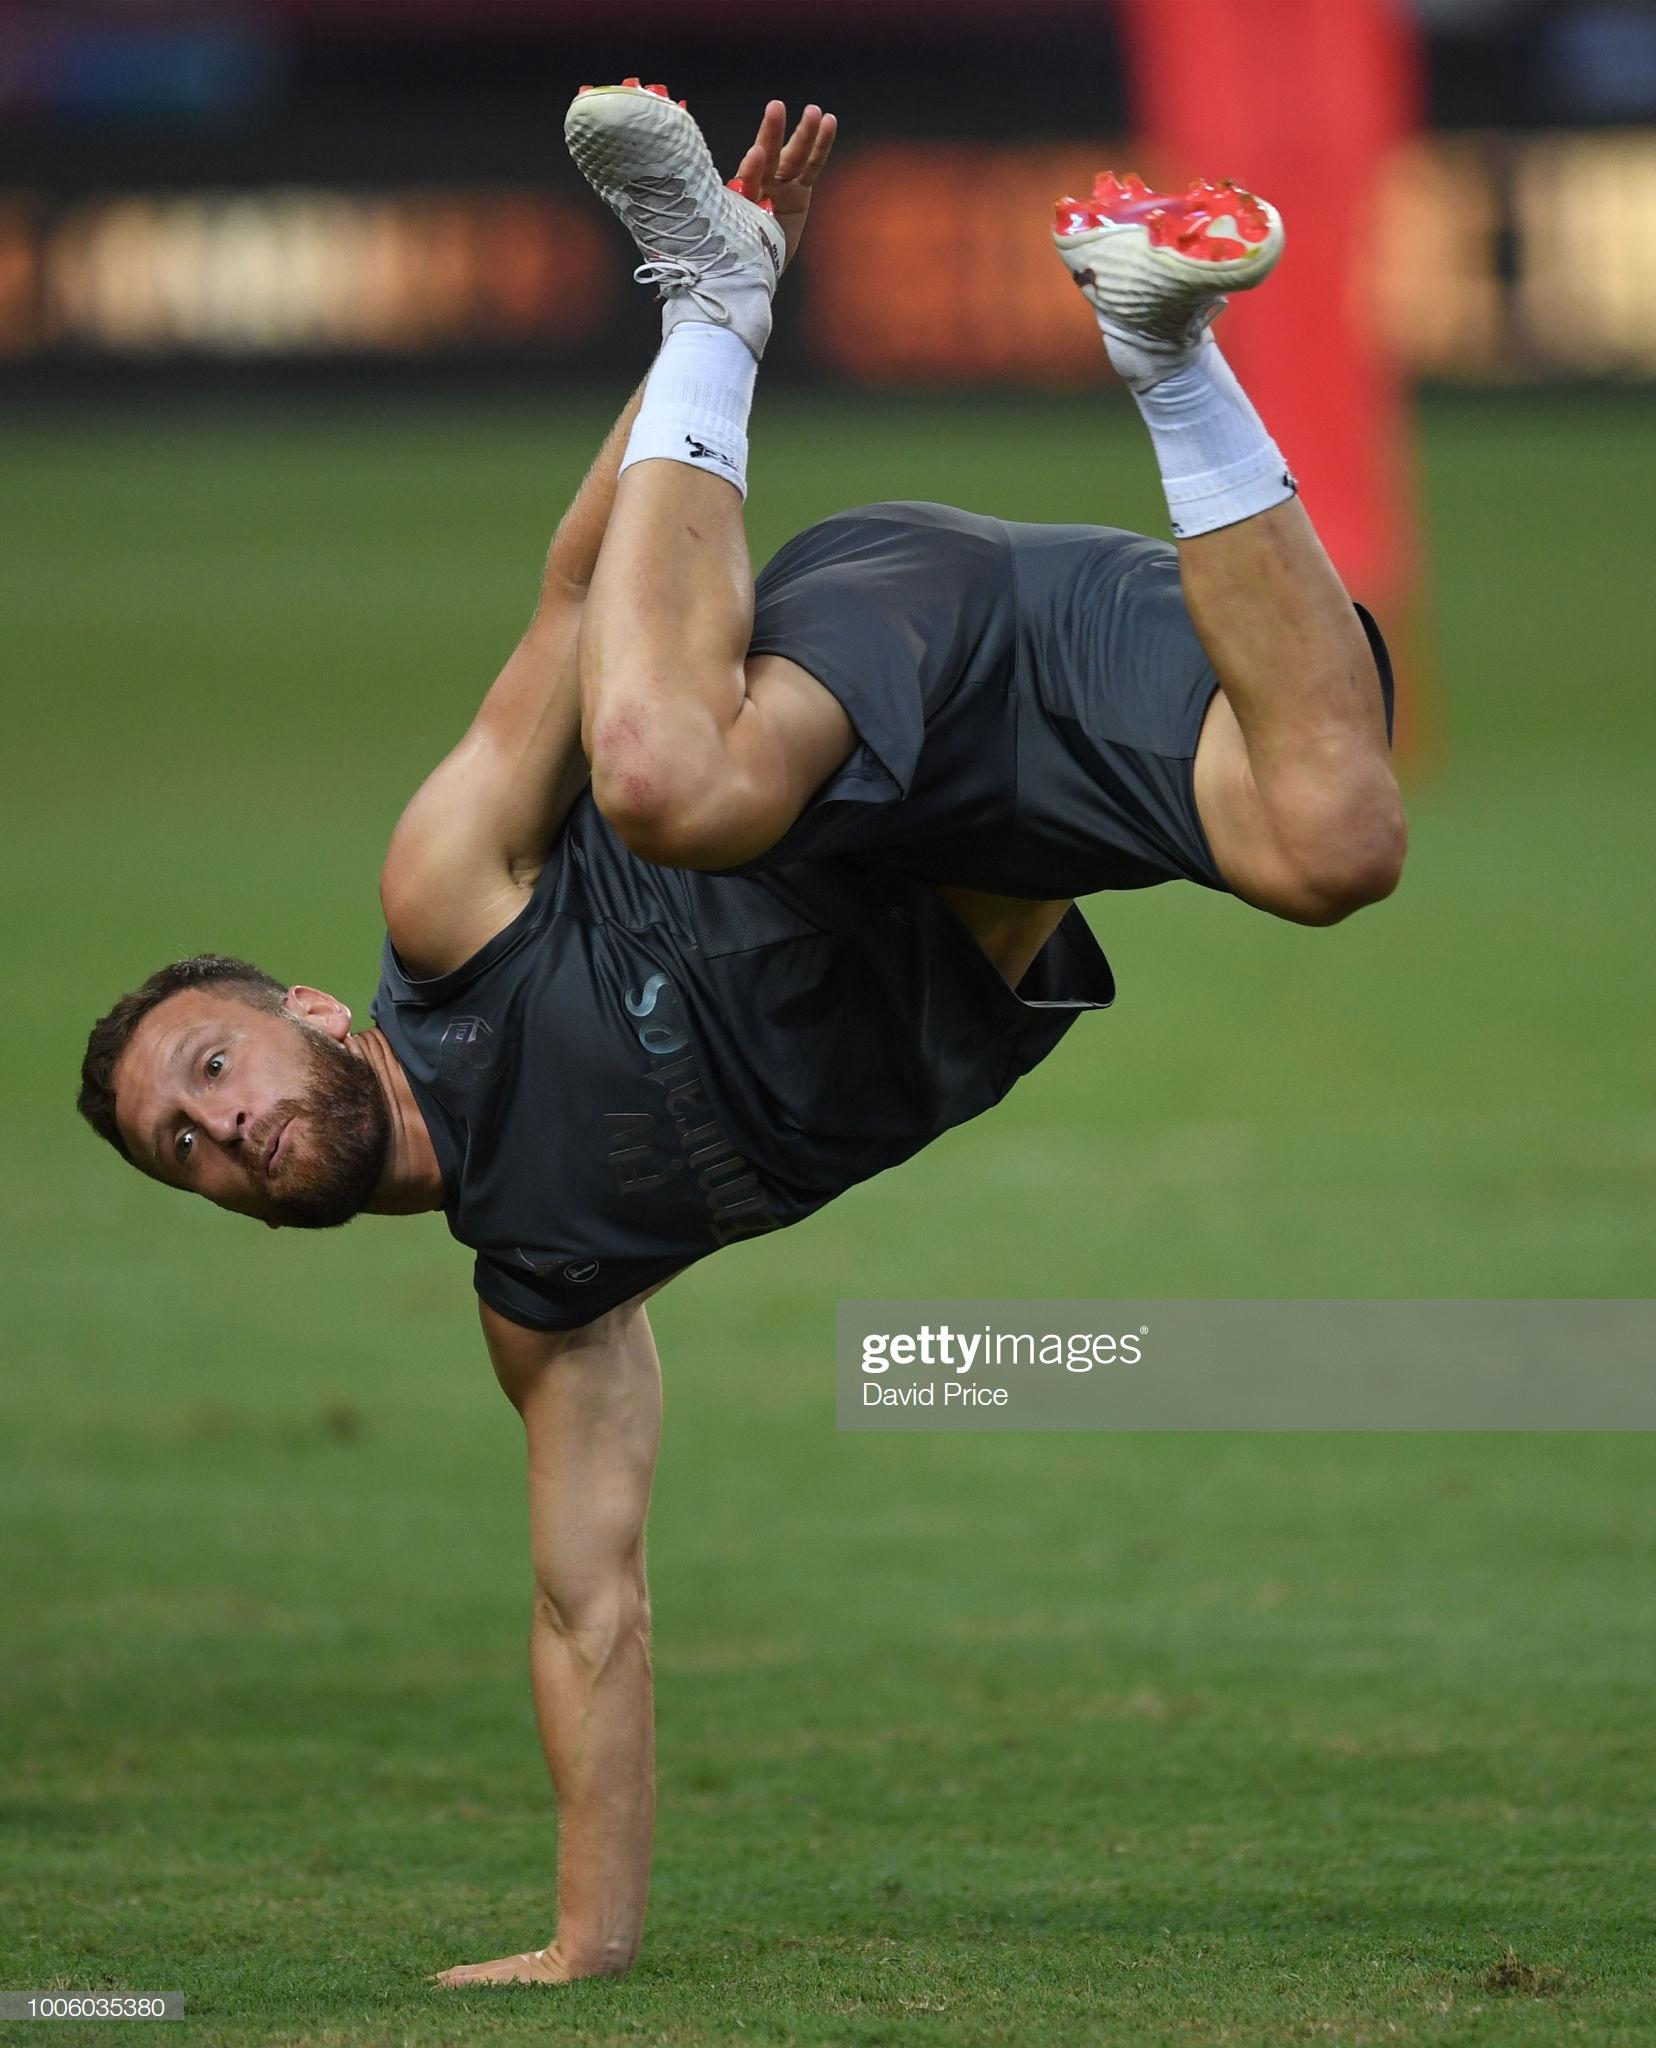 Mustafi acrobatie